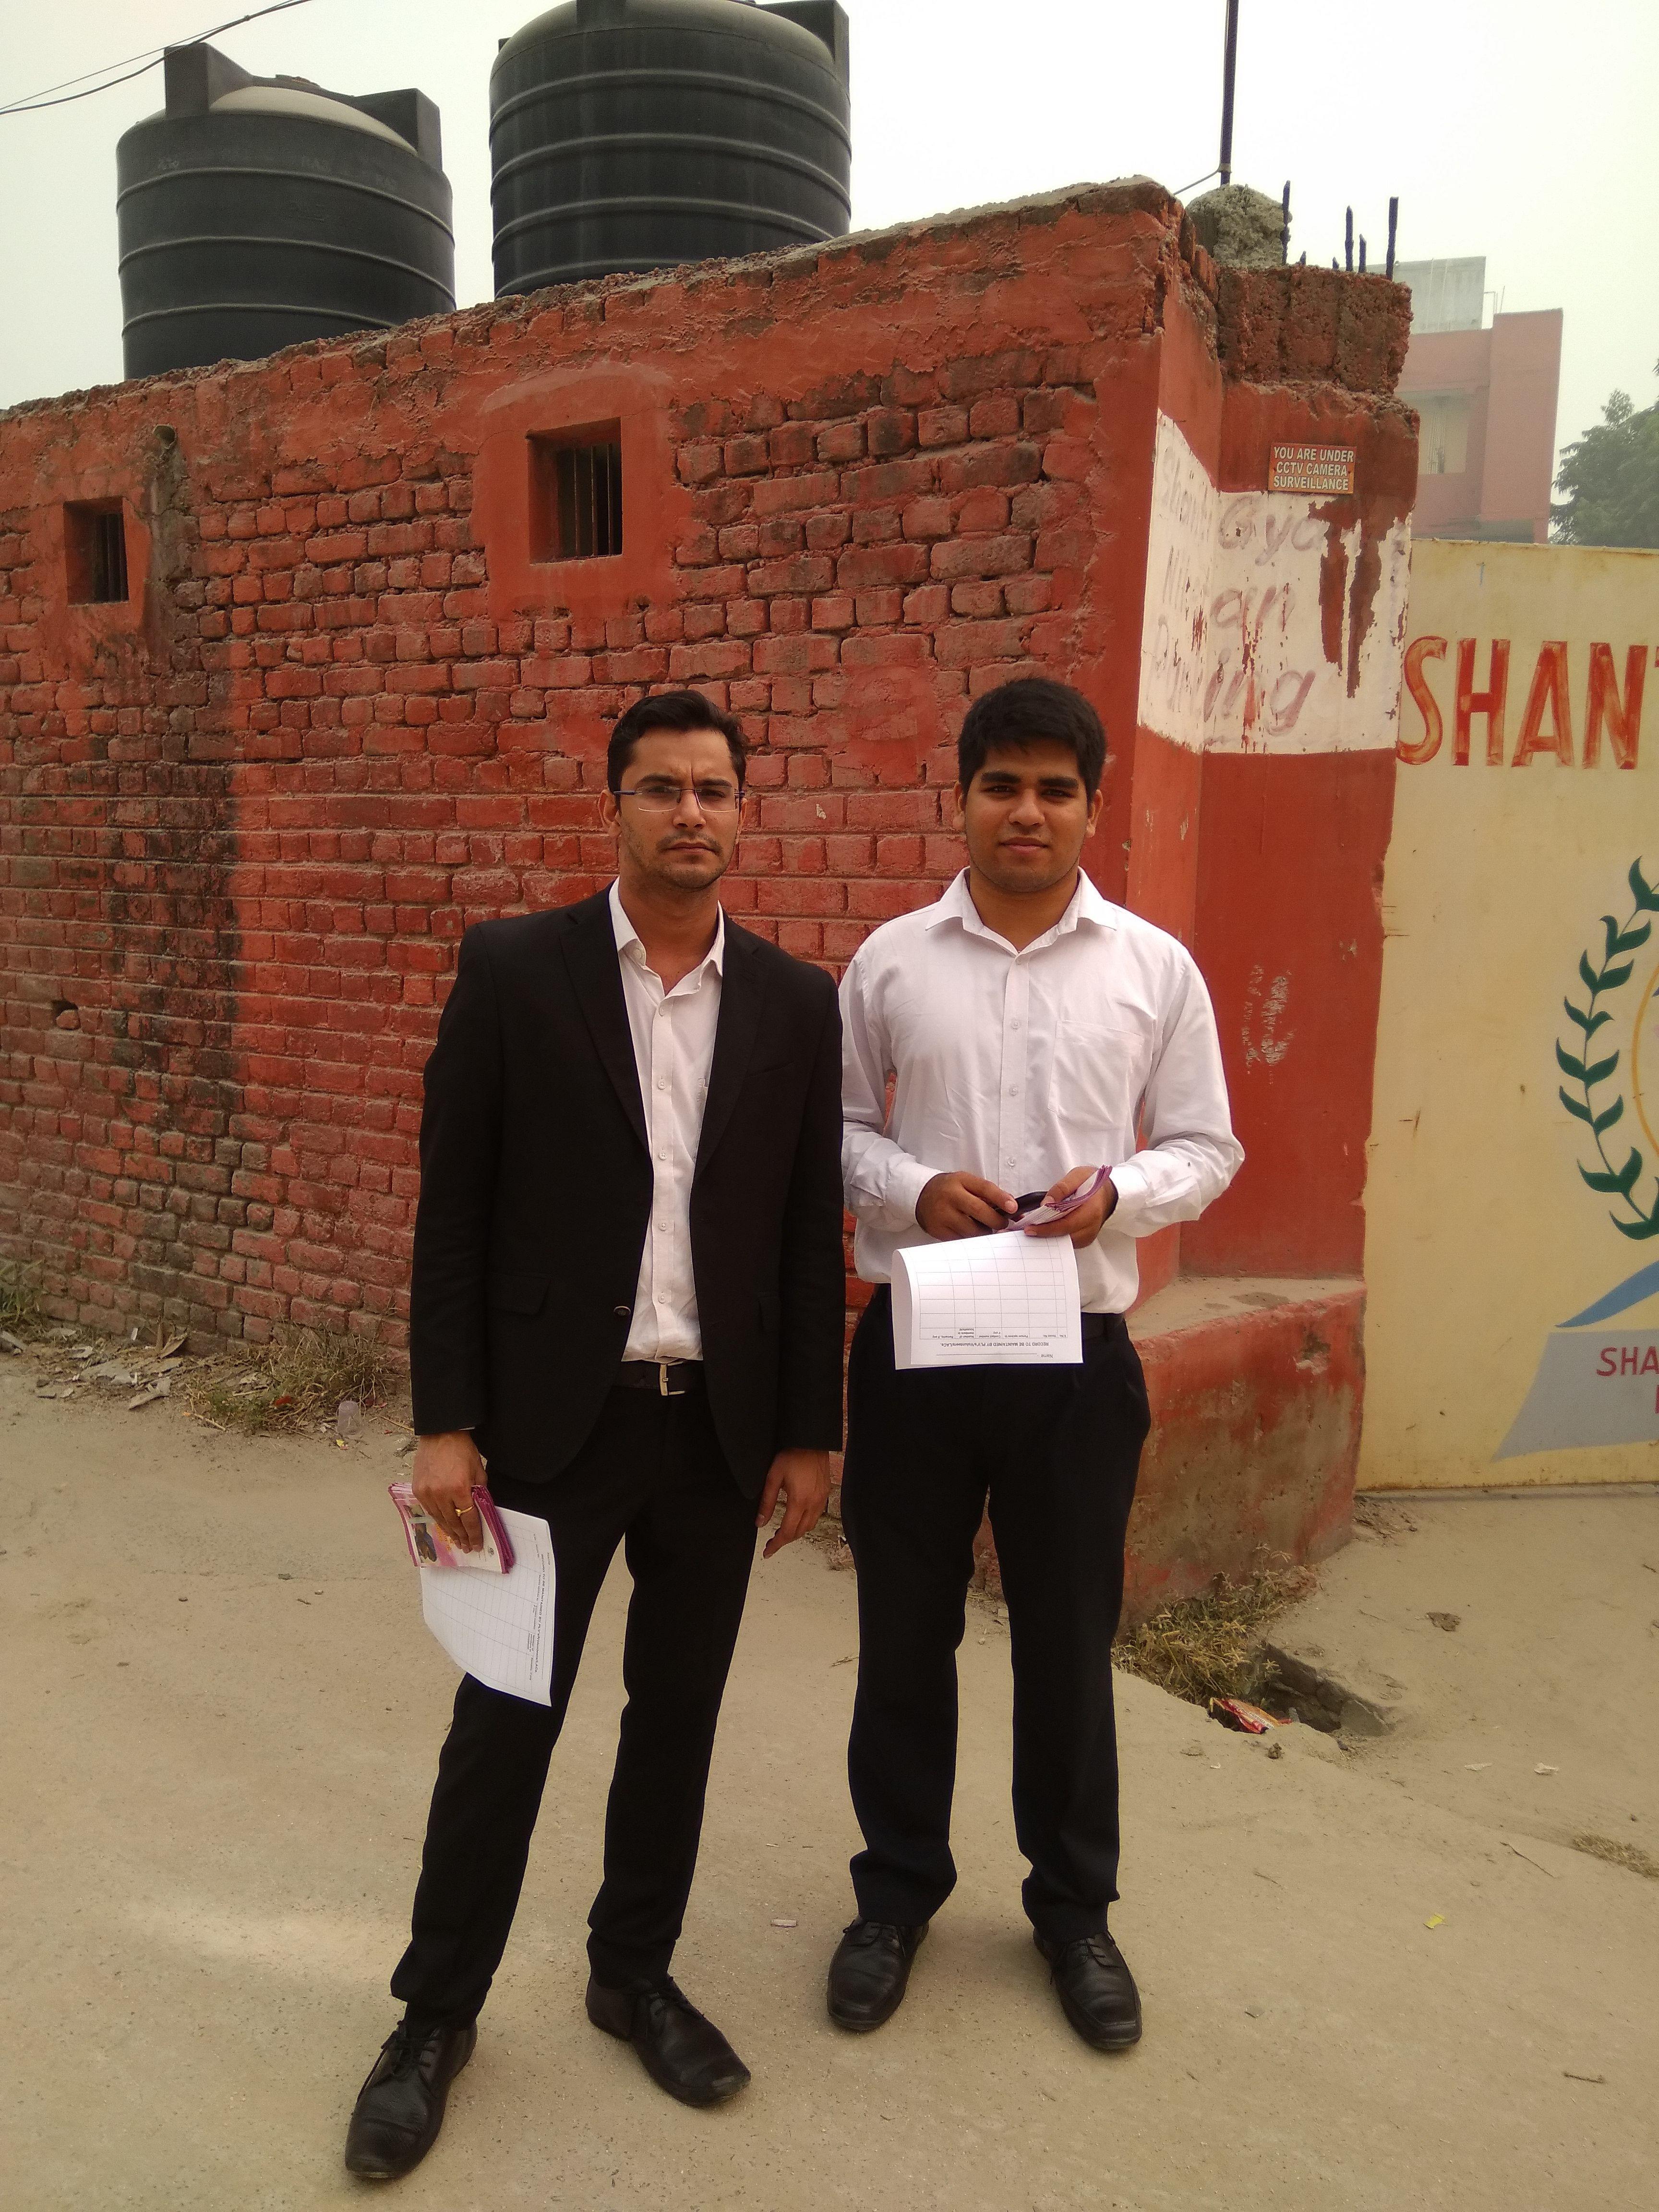 legal service advocates distributing legal aid material